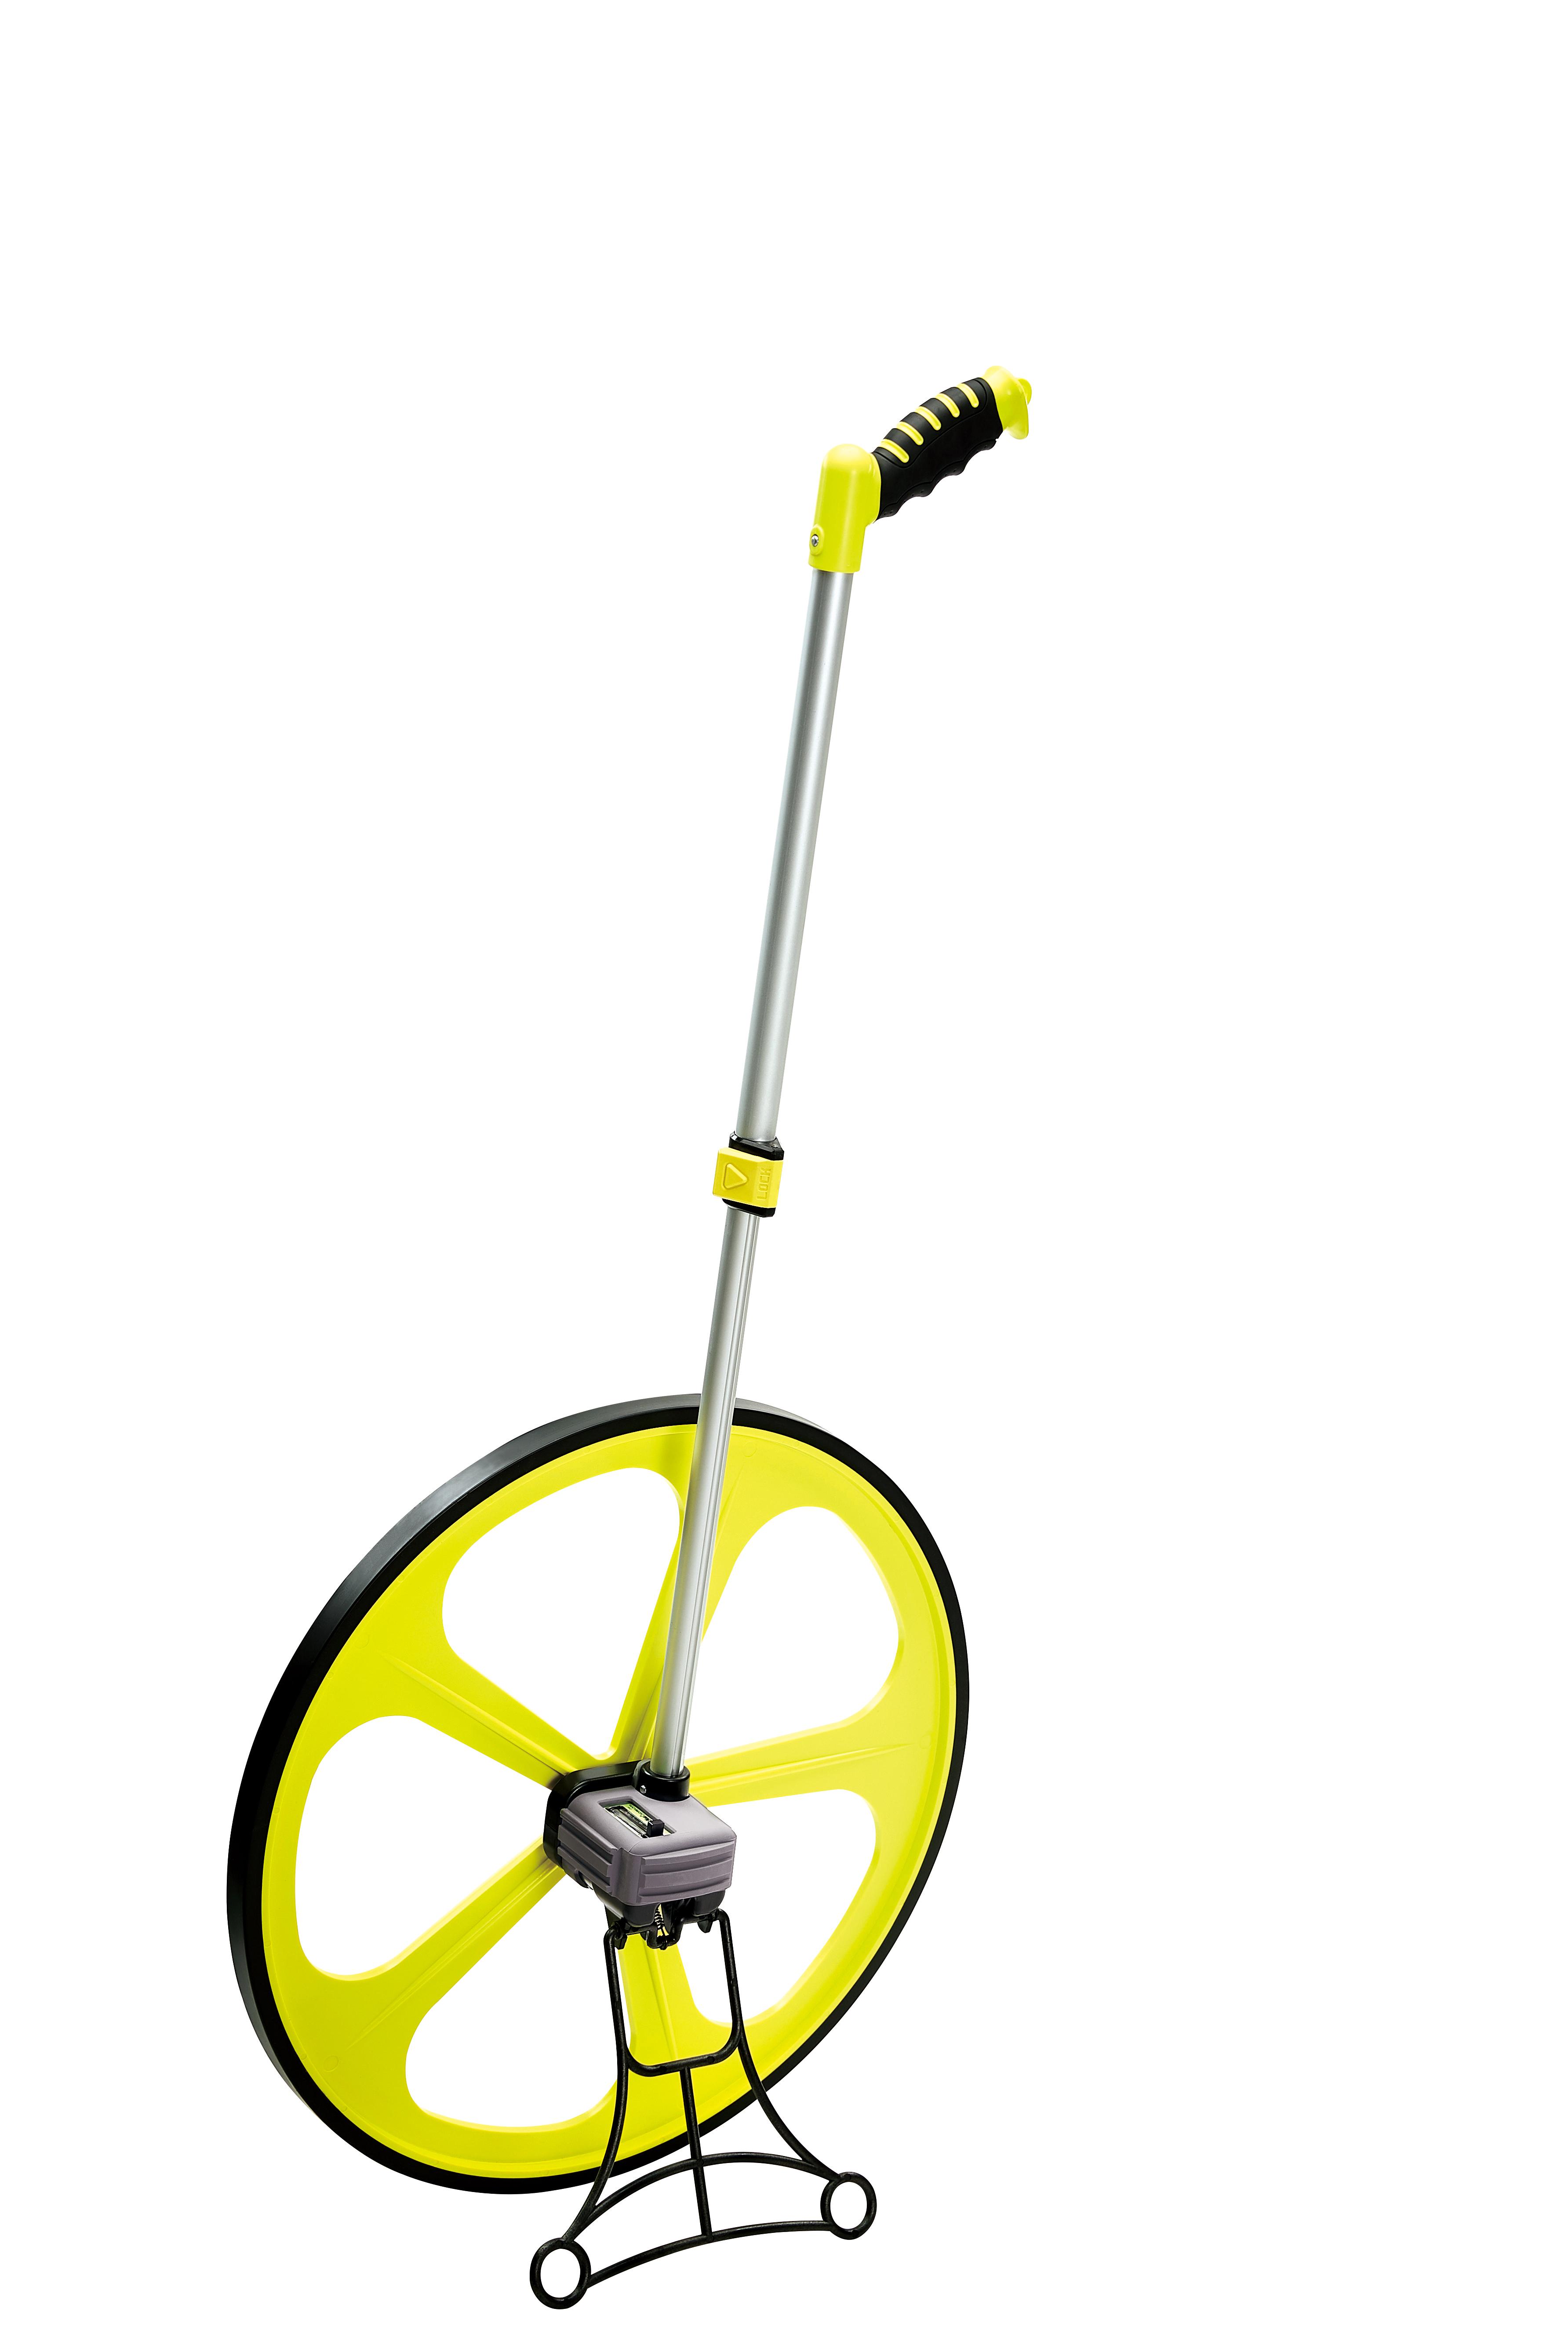 Counter MK6012 KOMELON Measuring Wheel